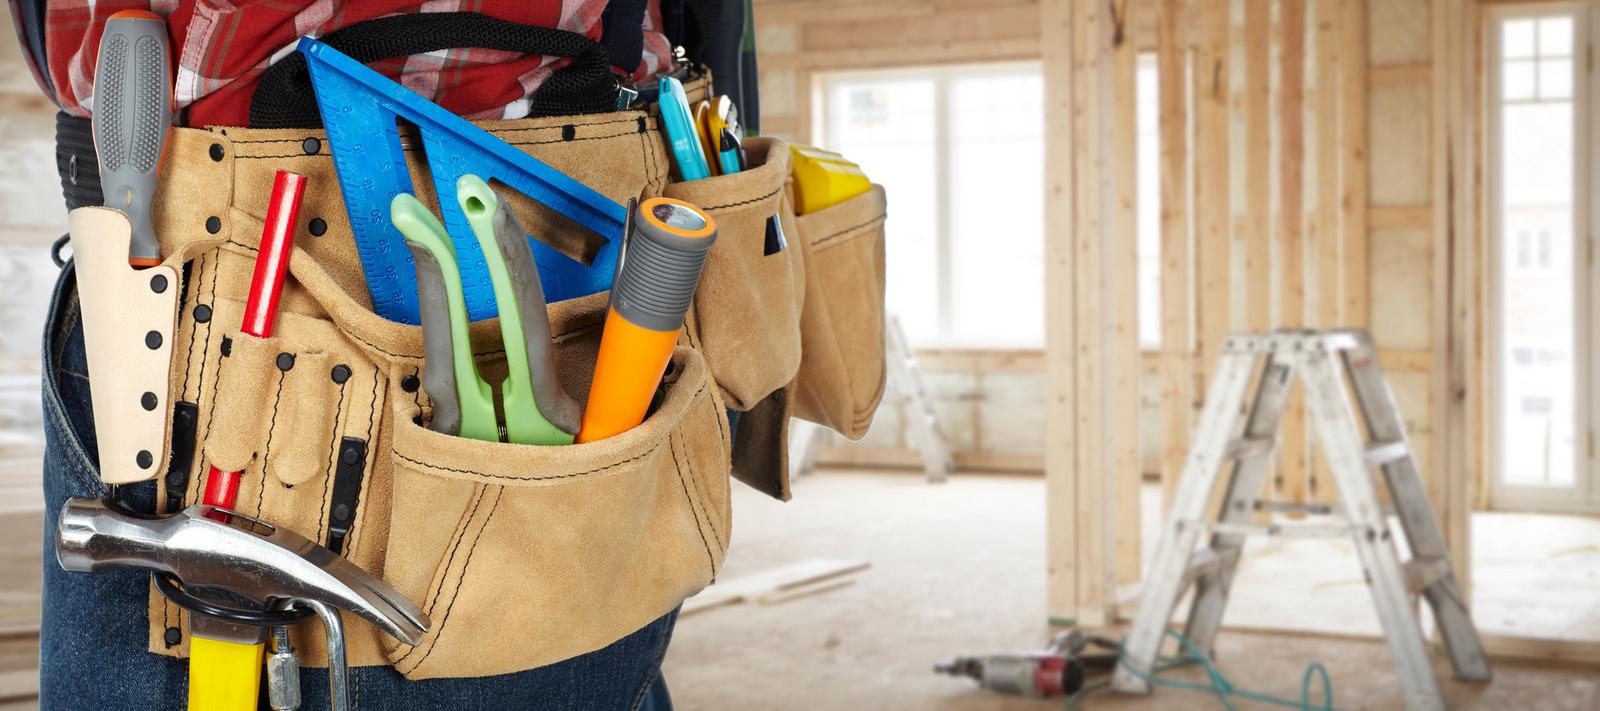 Materiale da costruzione